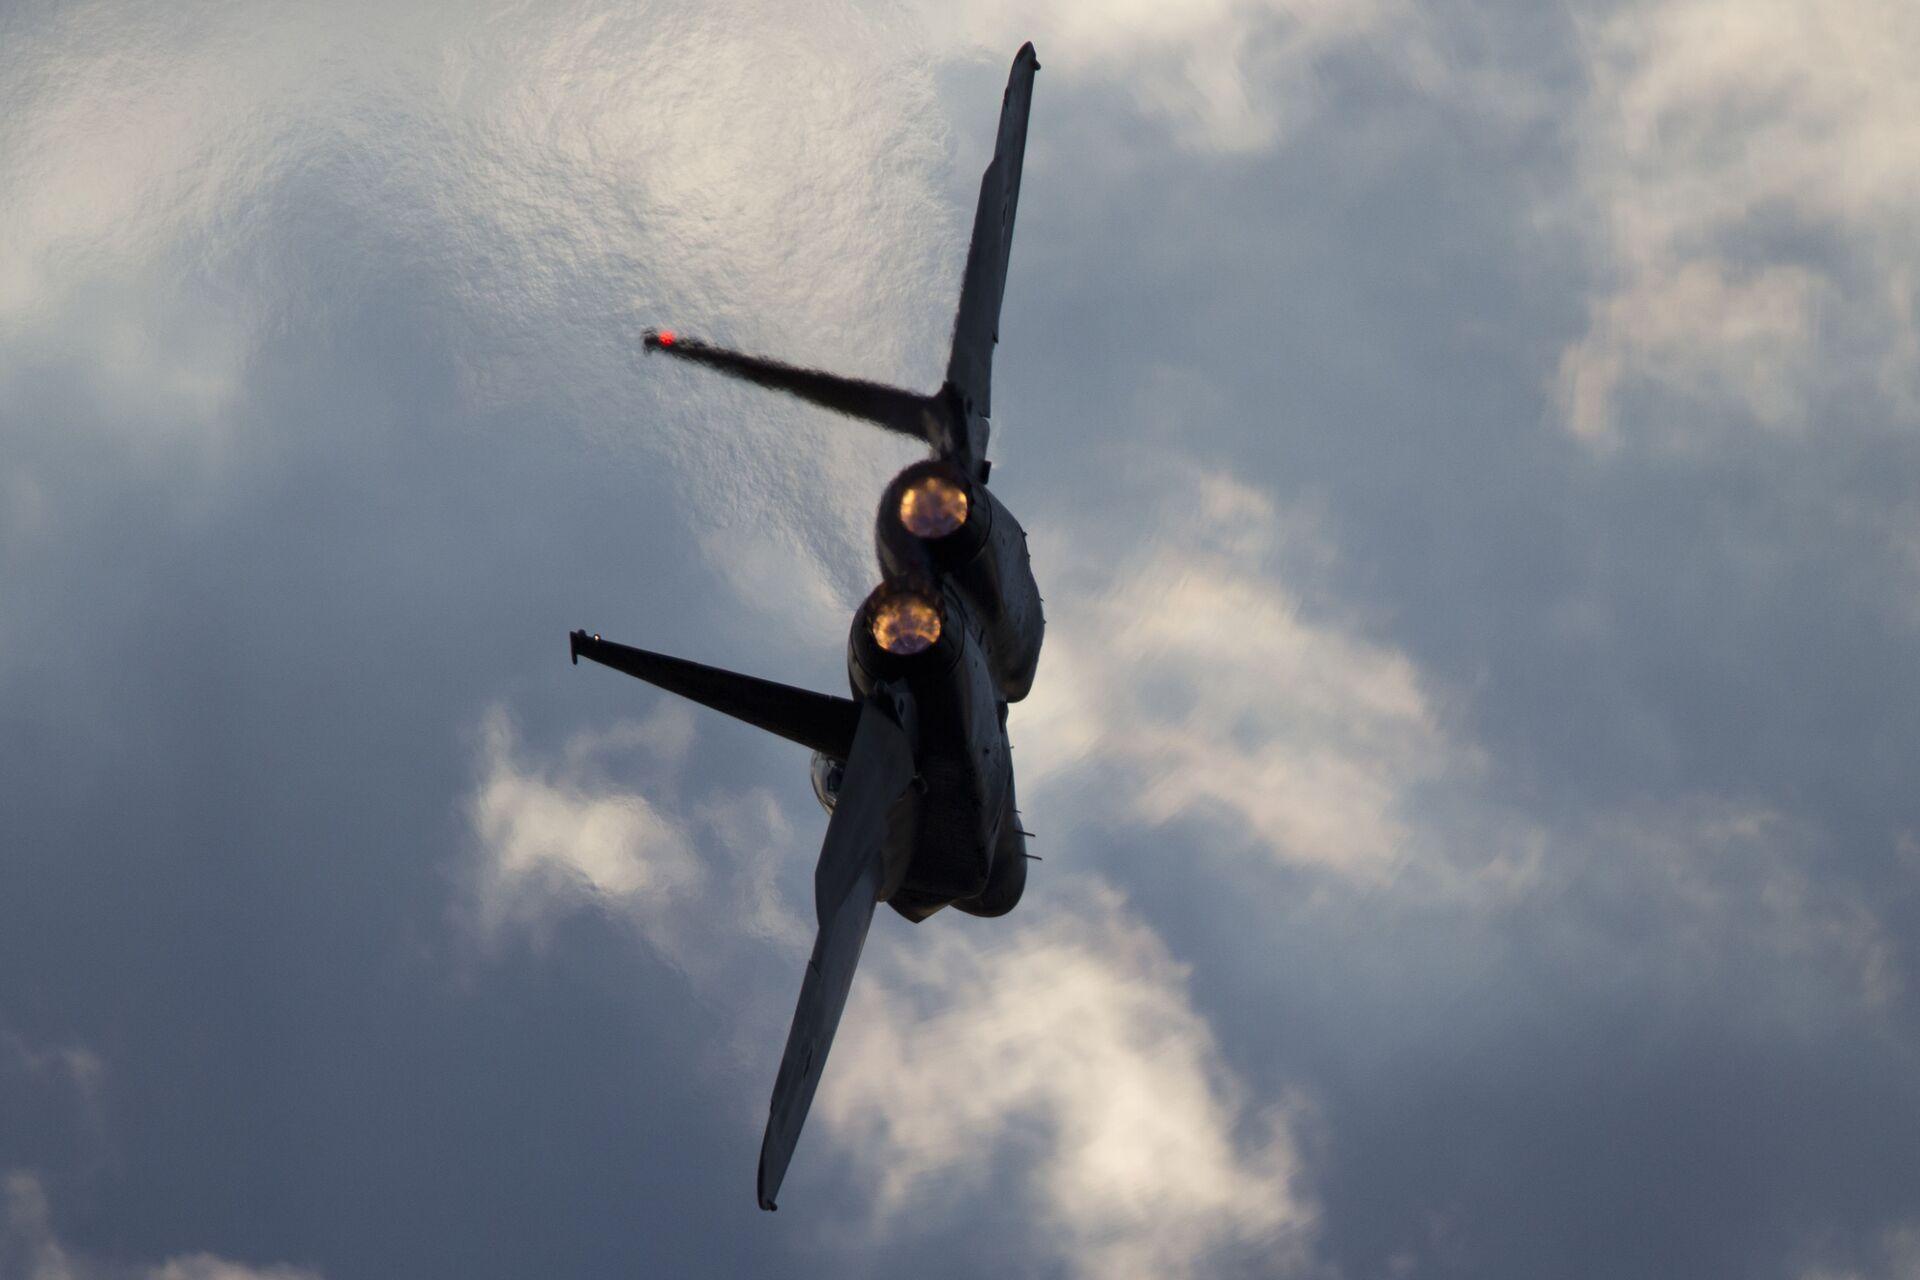 Un avión de caza F-15 israelí - Sputnik Mundo, 1920, 11.02.2021